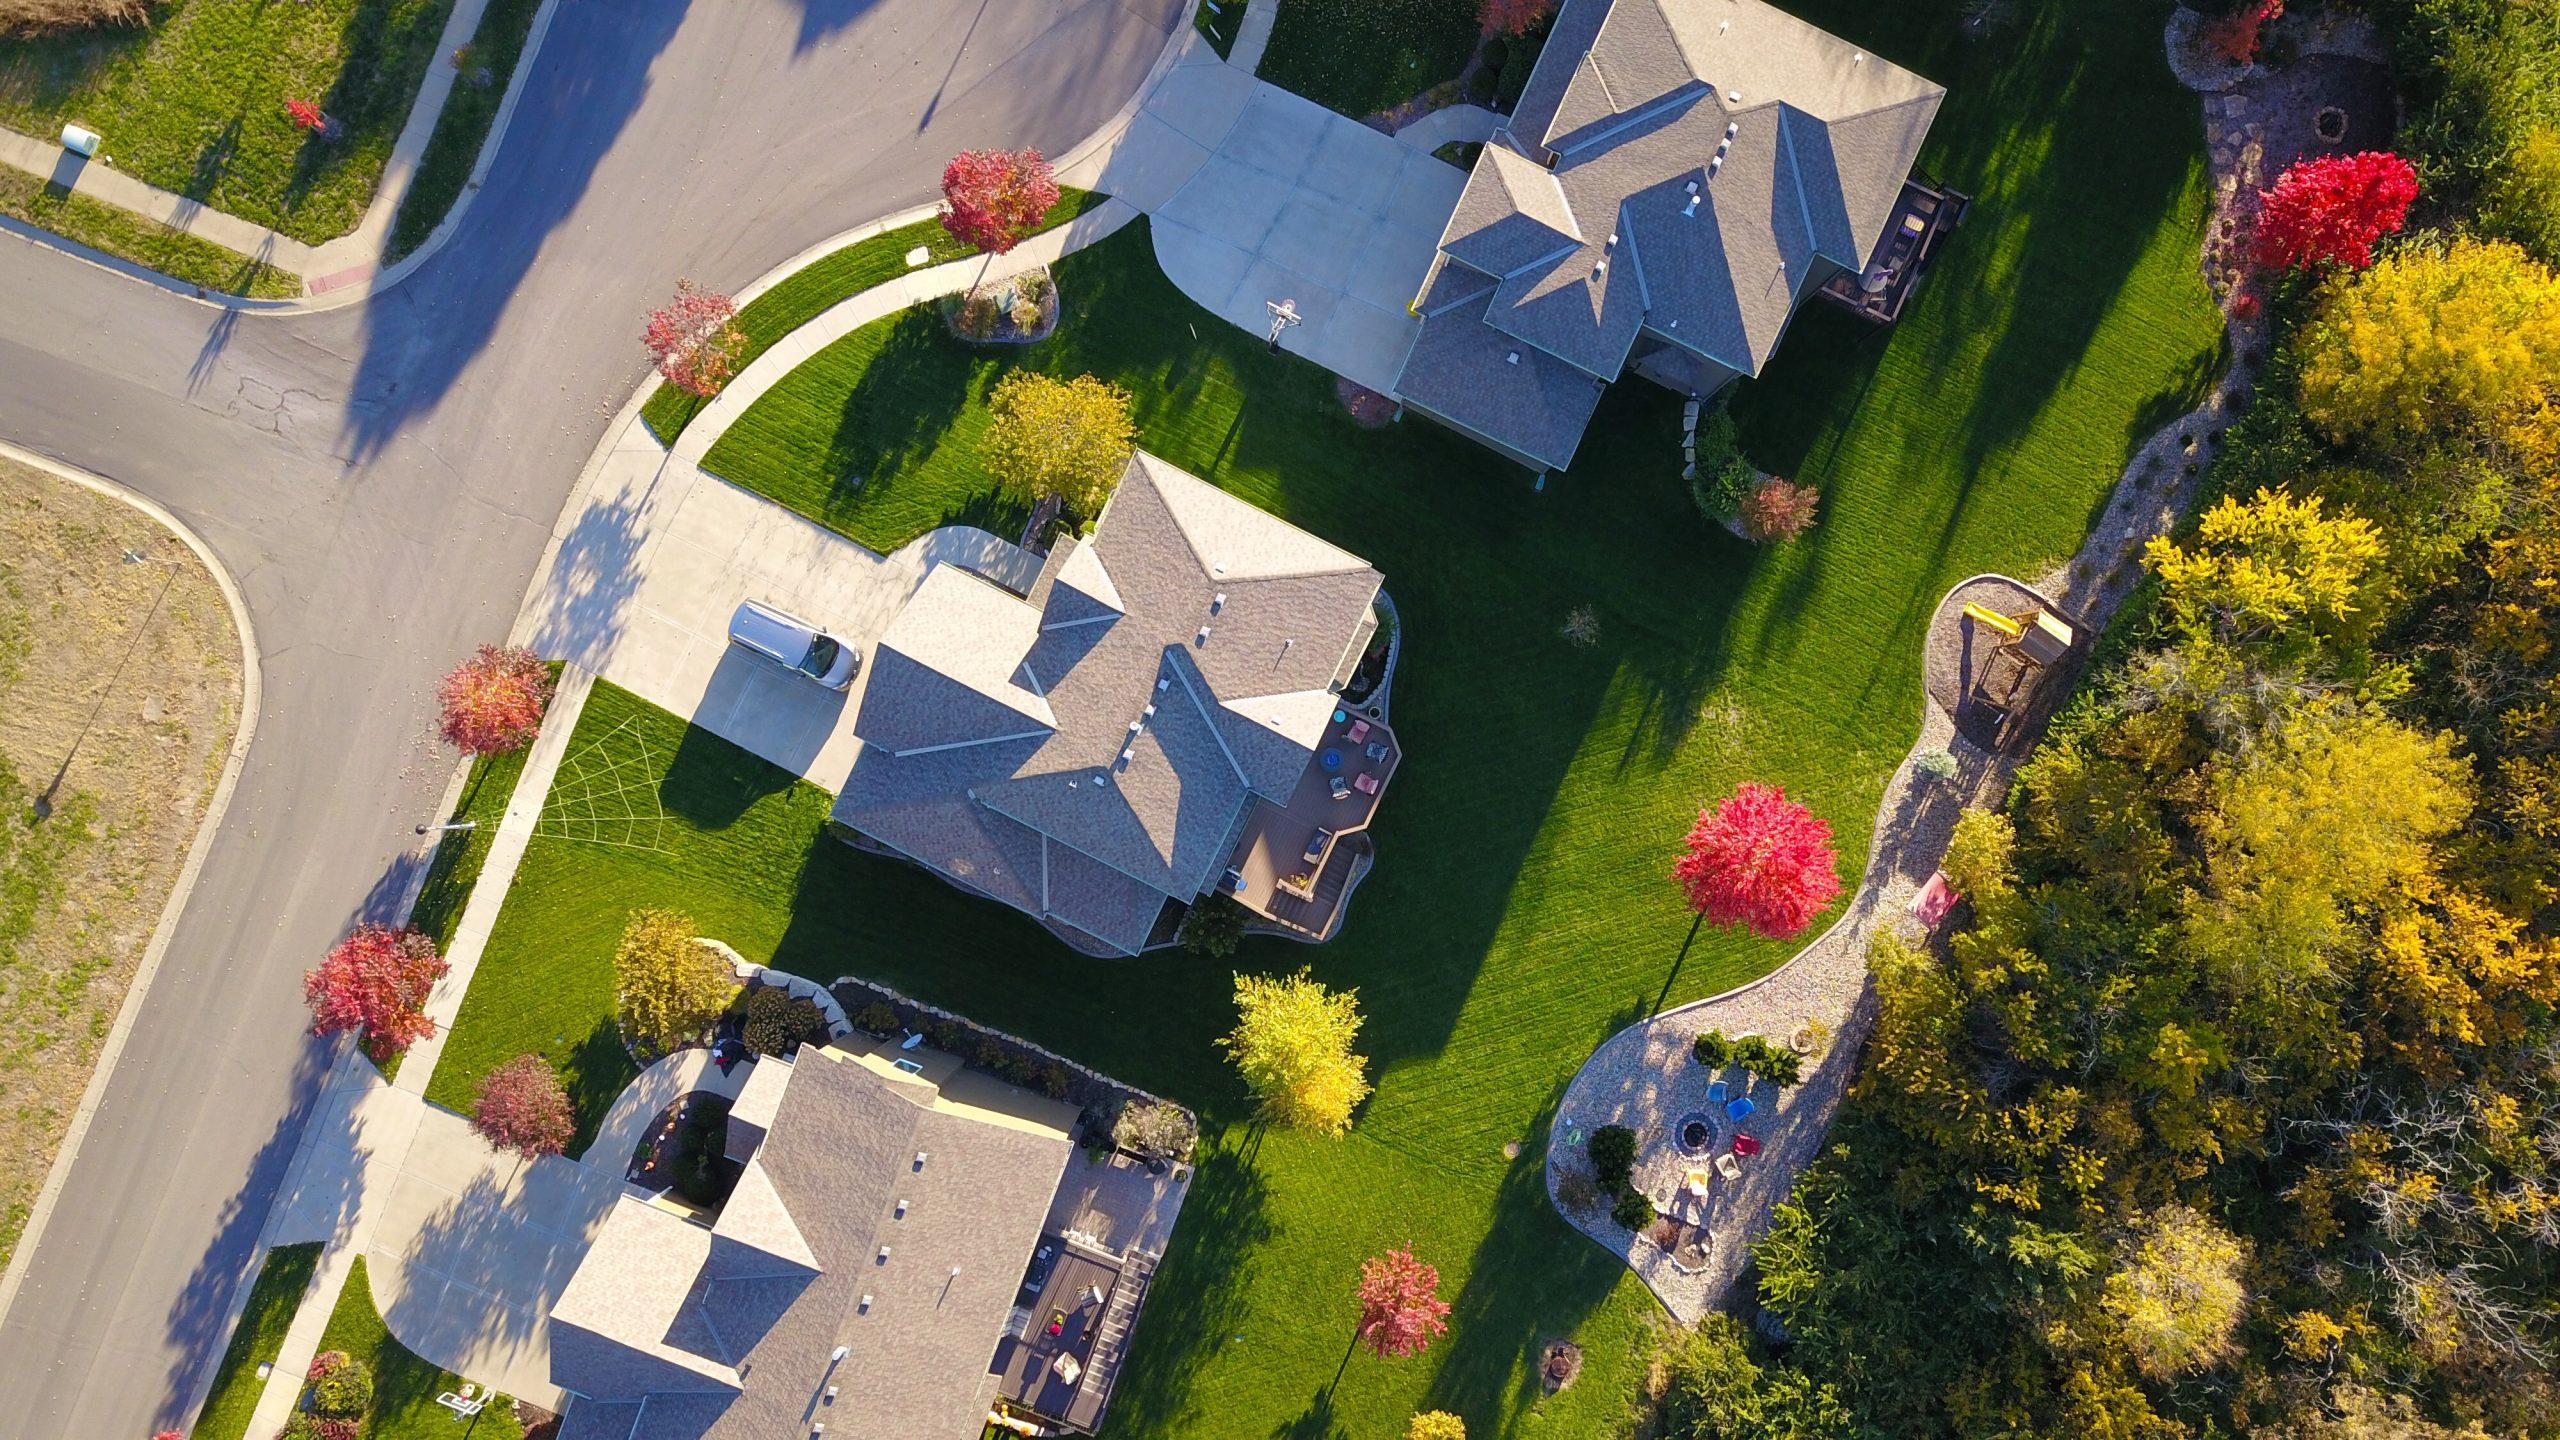 residential rental property in Lagos Nigeria